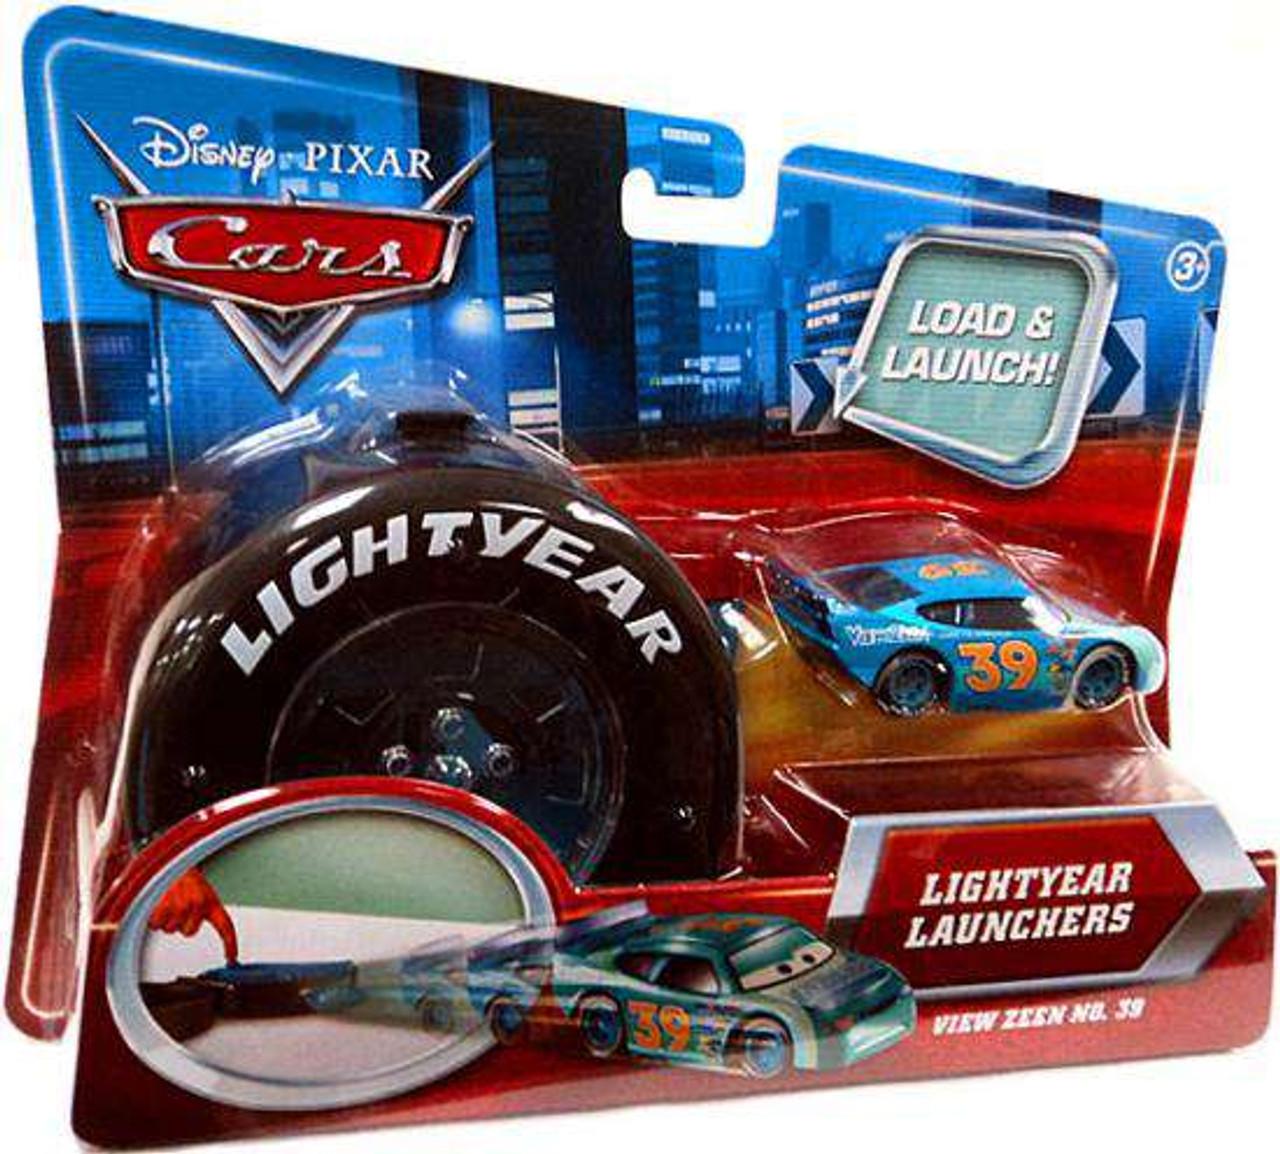 Disney Cars Lightyear Launchers View Zeen No. 39 Diecast Car